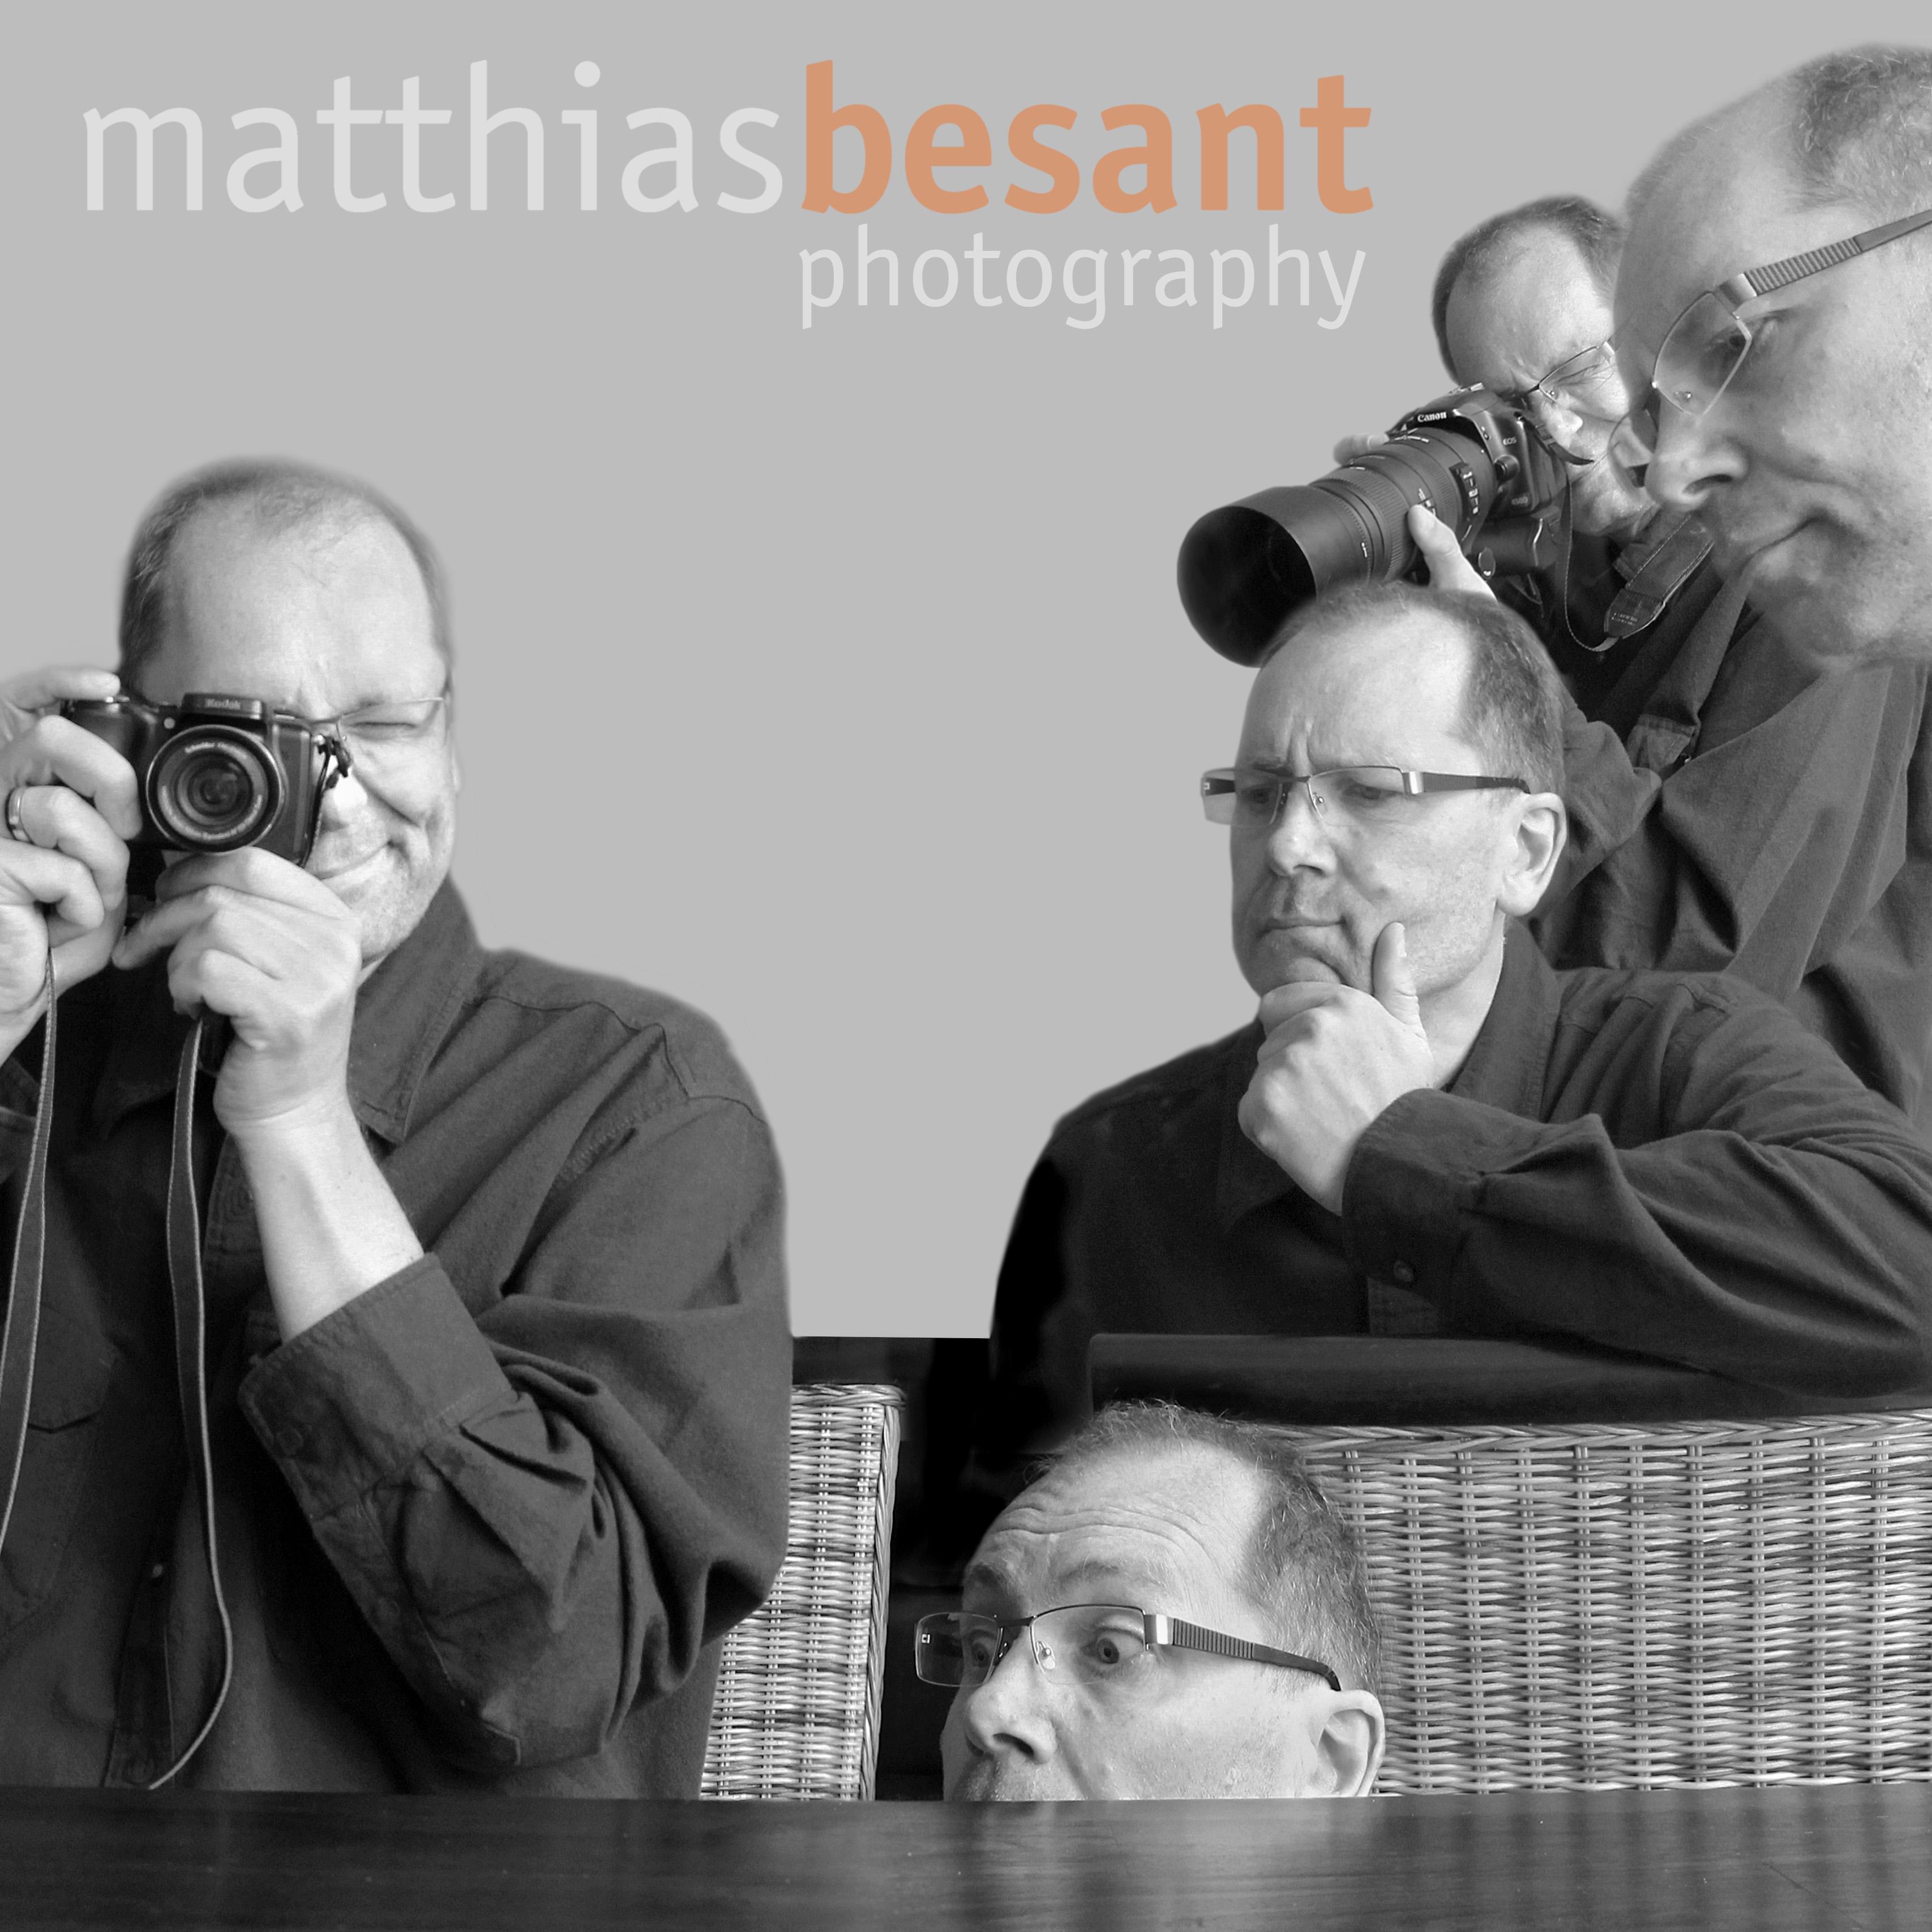 Matthias Besant